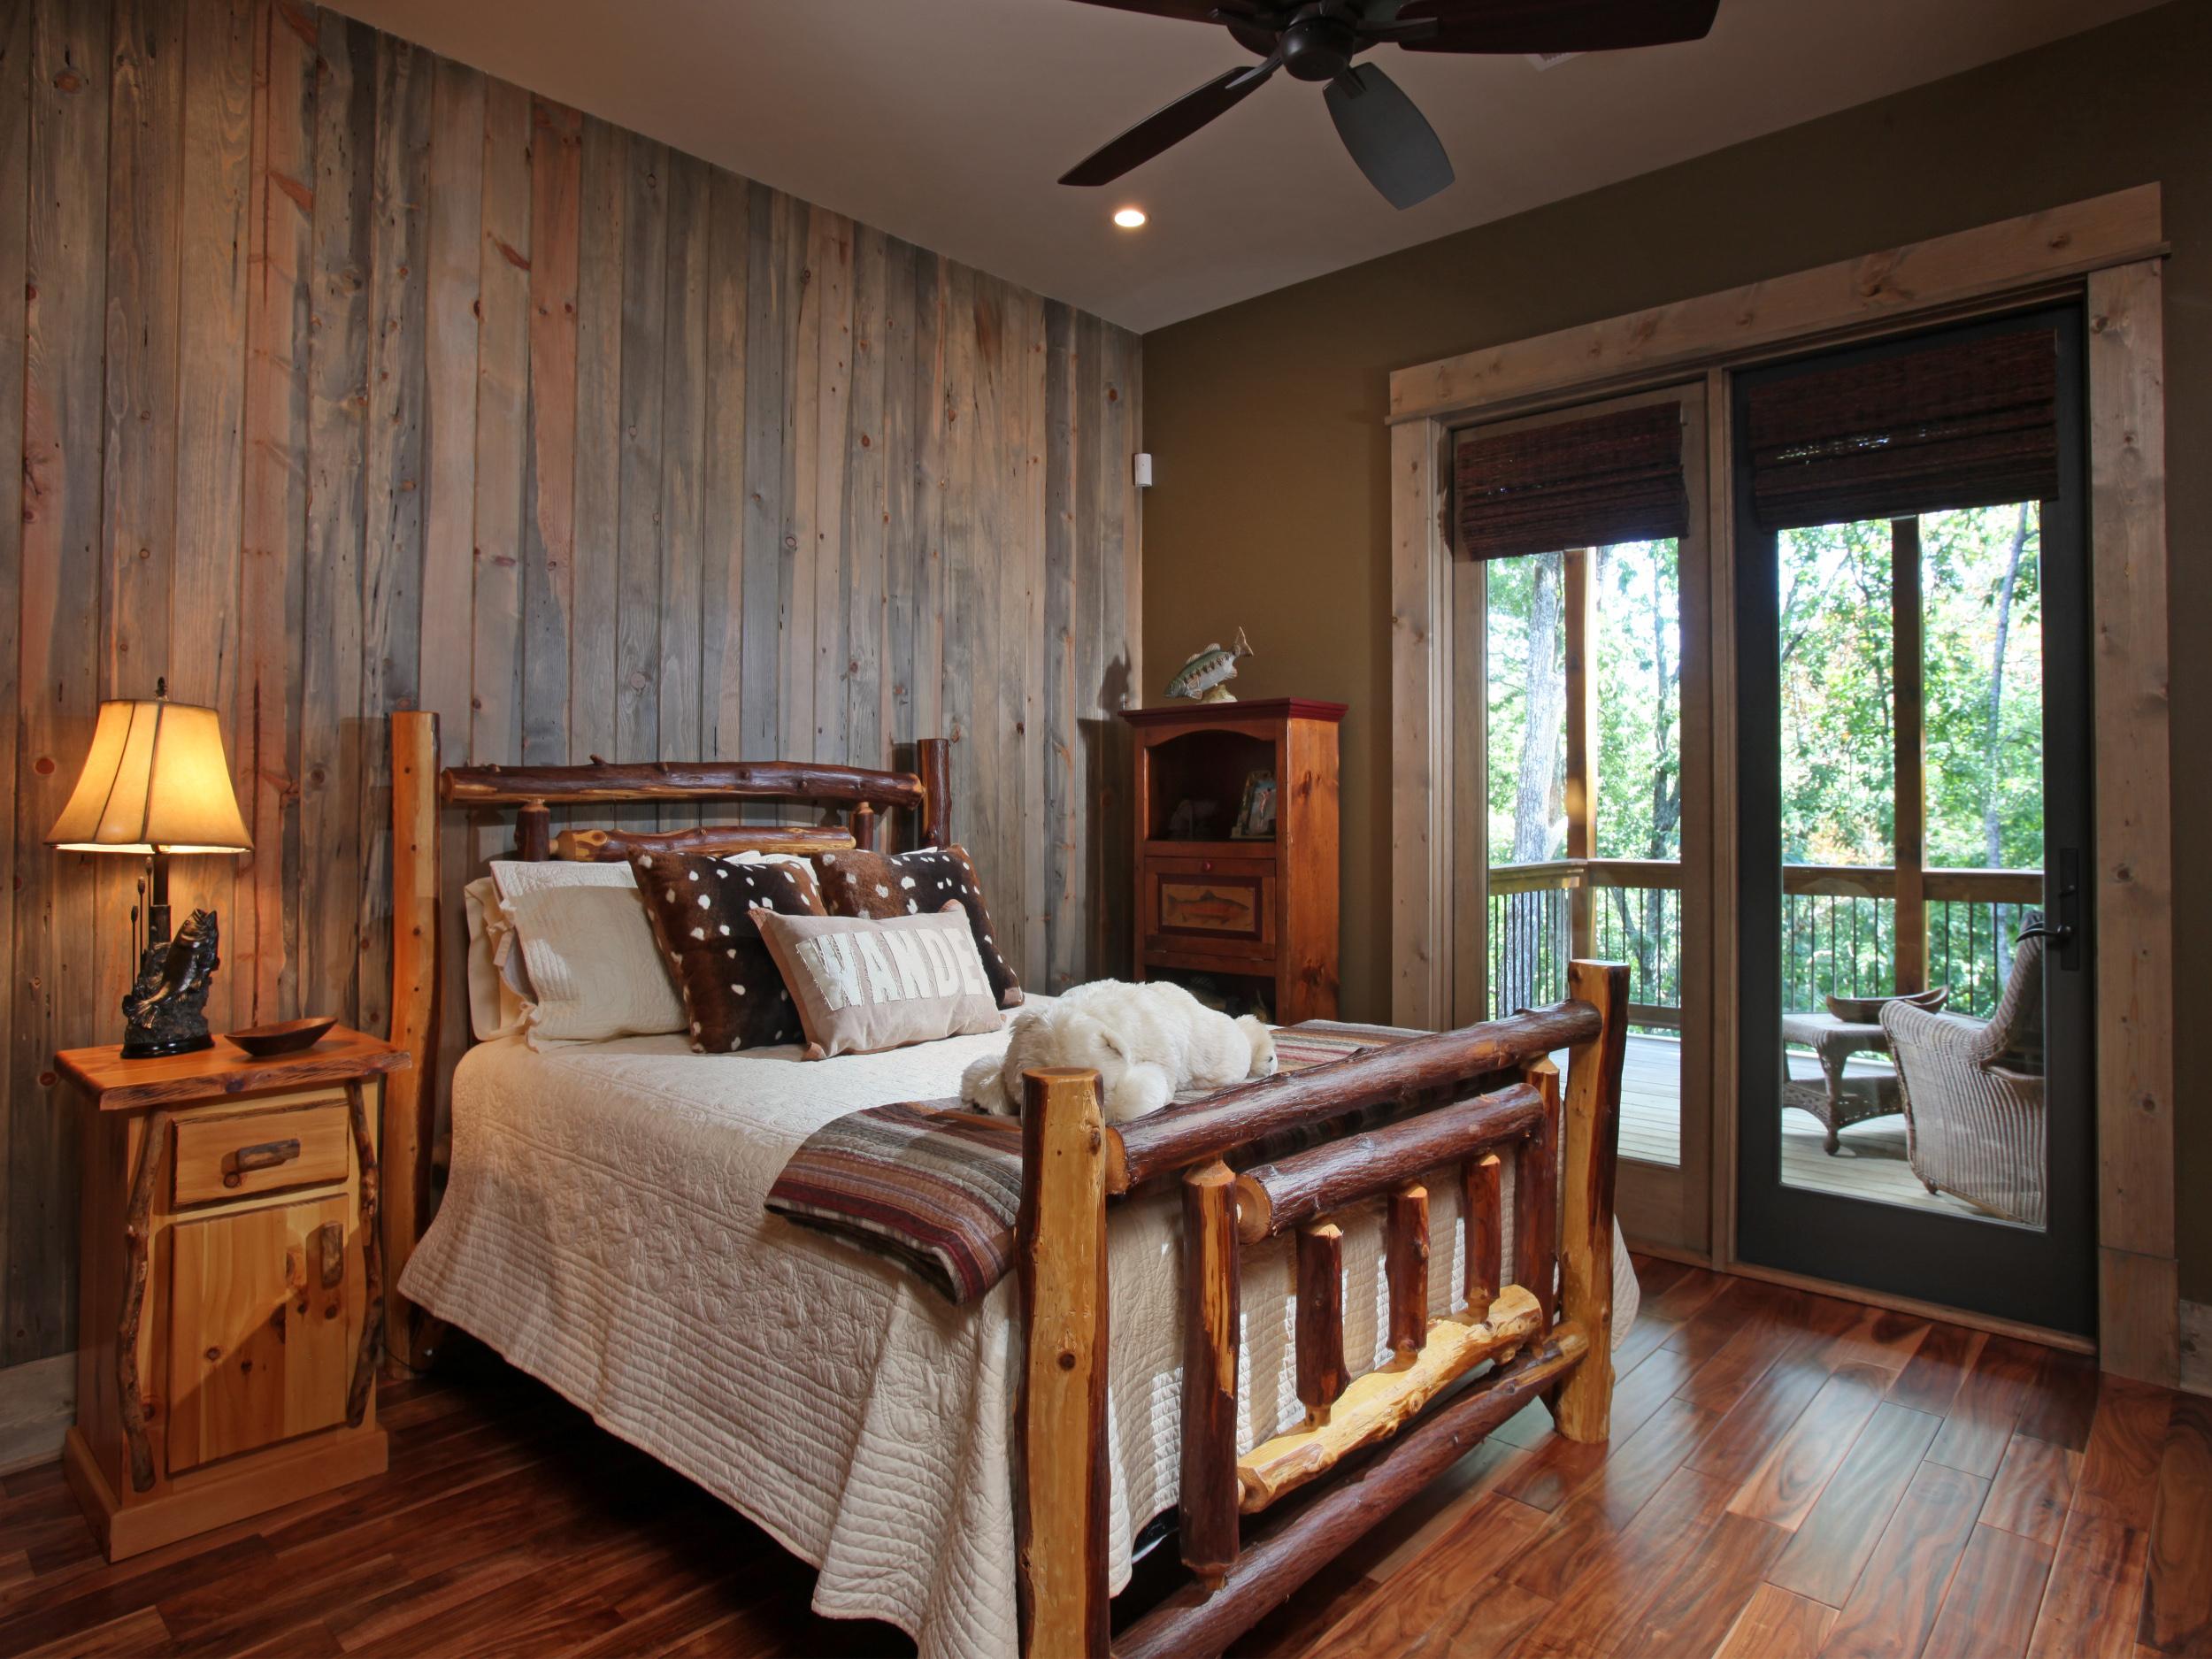 5572 864 red fox lanemodern rustic homes custom 2016 big for The lodge at big canoe